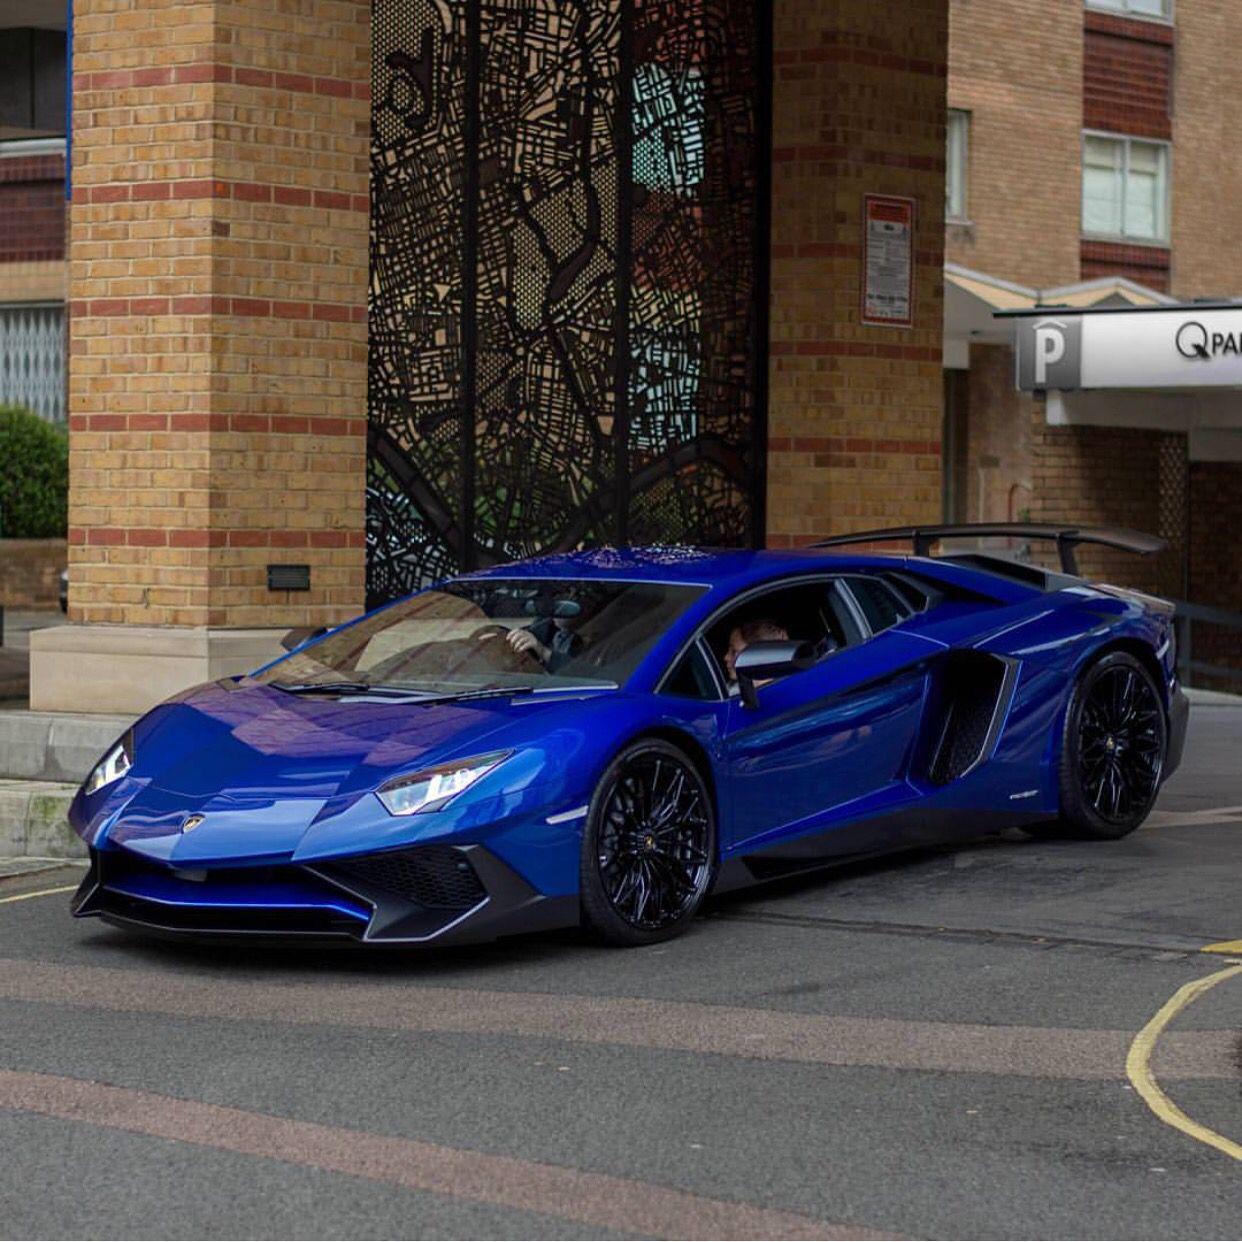 Lamborghini Aventador Super Veloce Coupe Painted In Blu